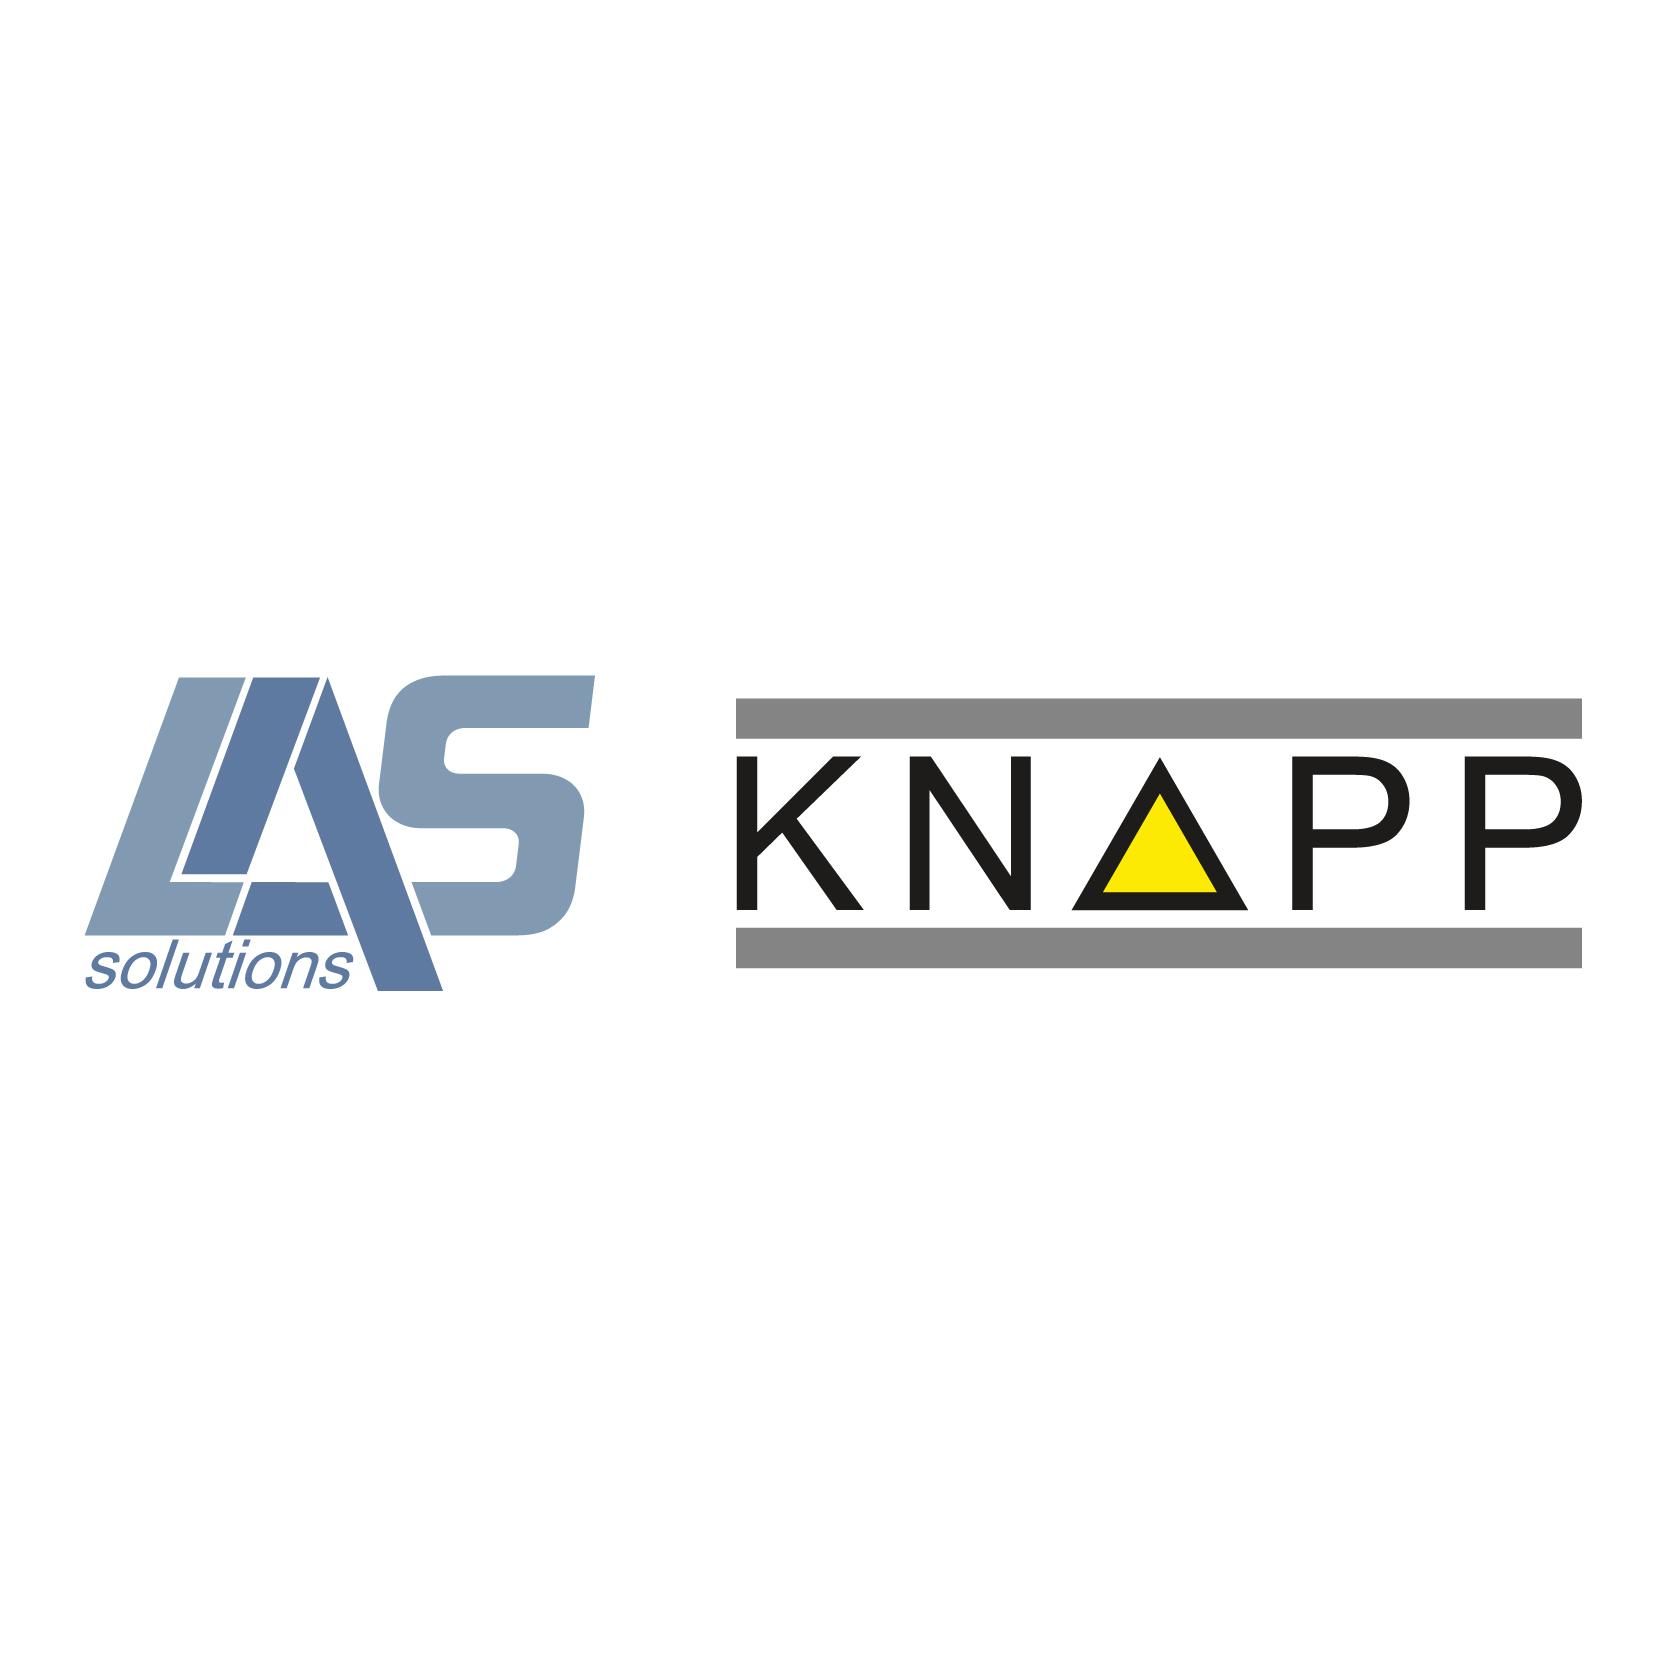 Las KNAP Logo